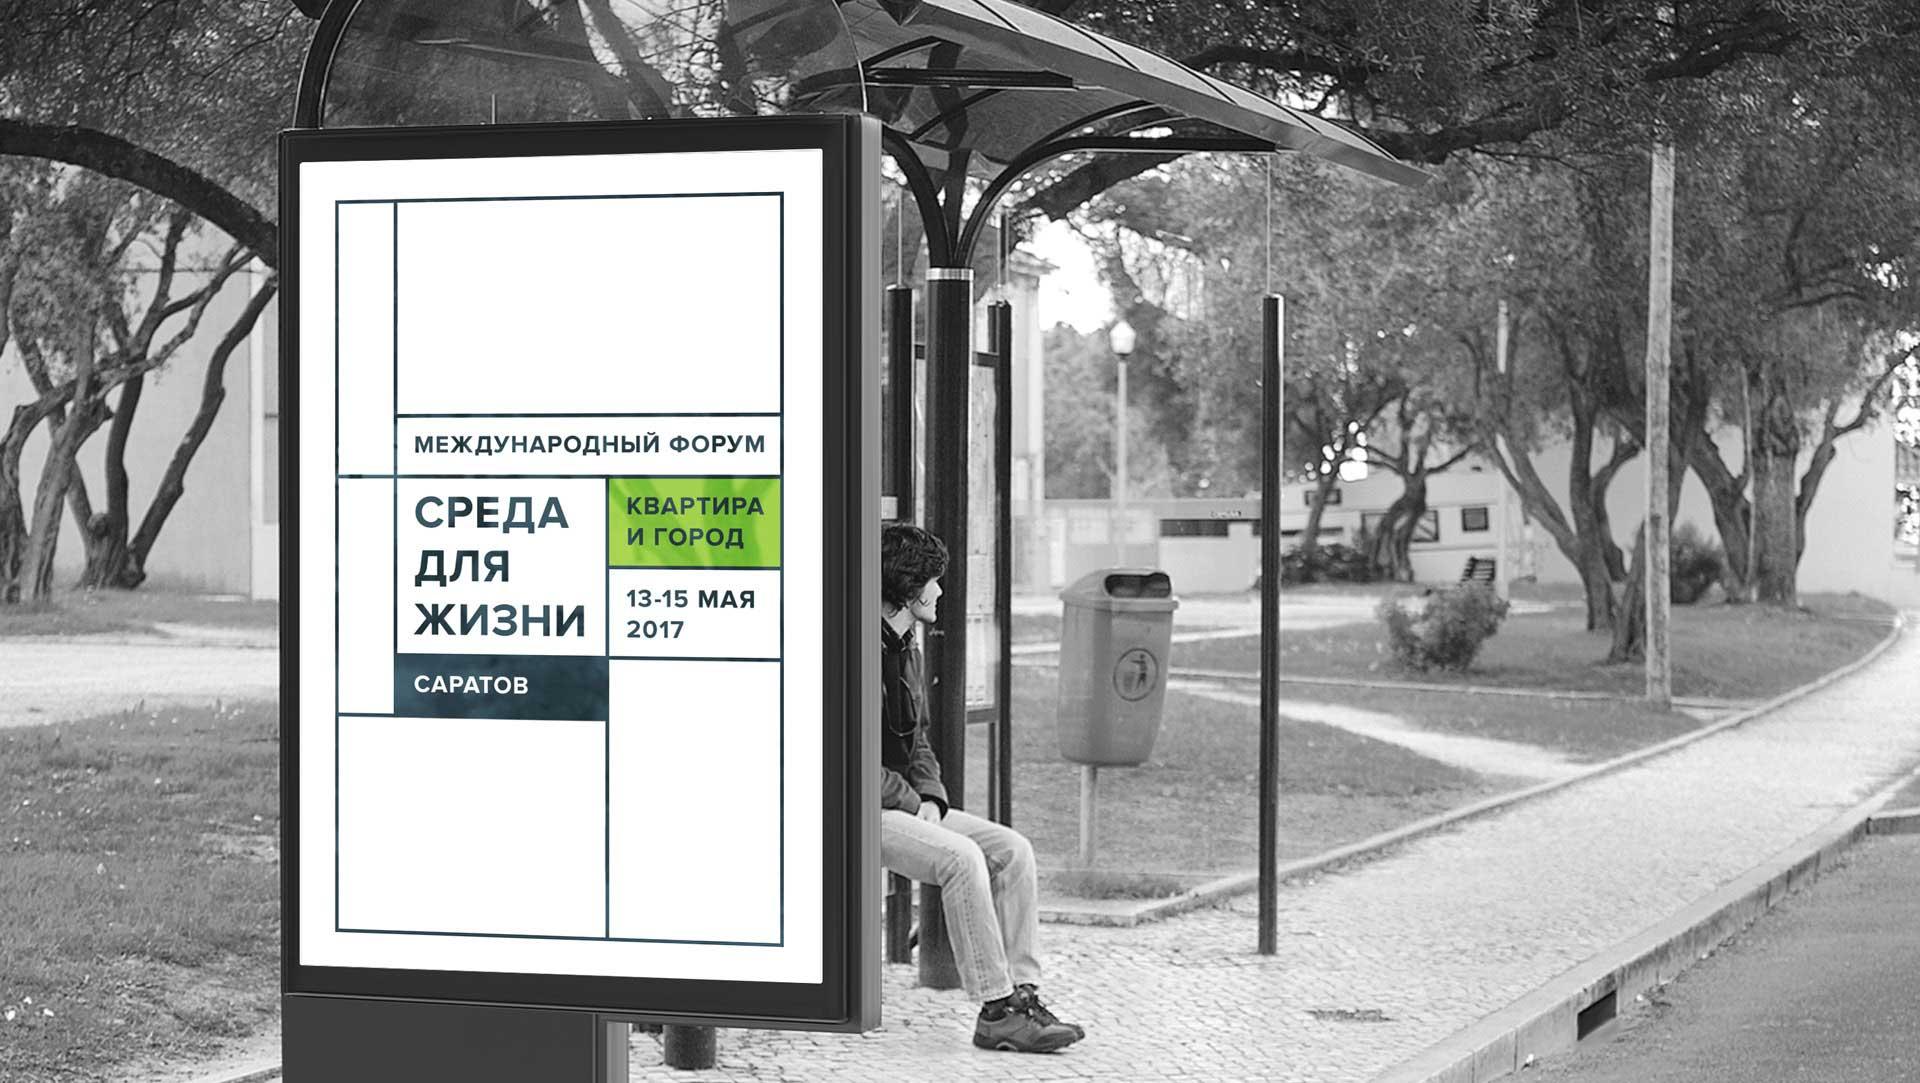 http://the-madmen.ru/wp-content/uploads/2019/Портфолио/Среда_для_жизни/P_TMM_SForum_Logo_170217_v4_Page_09.jpg